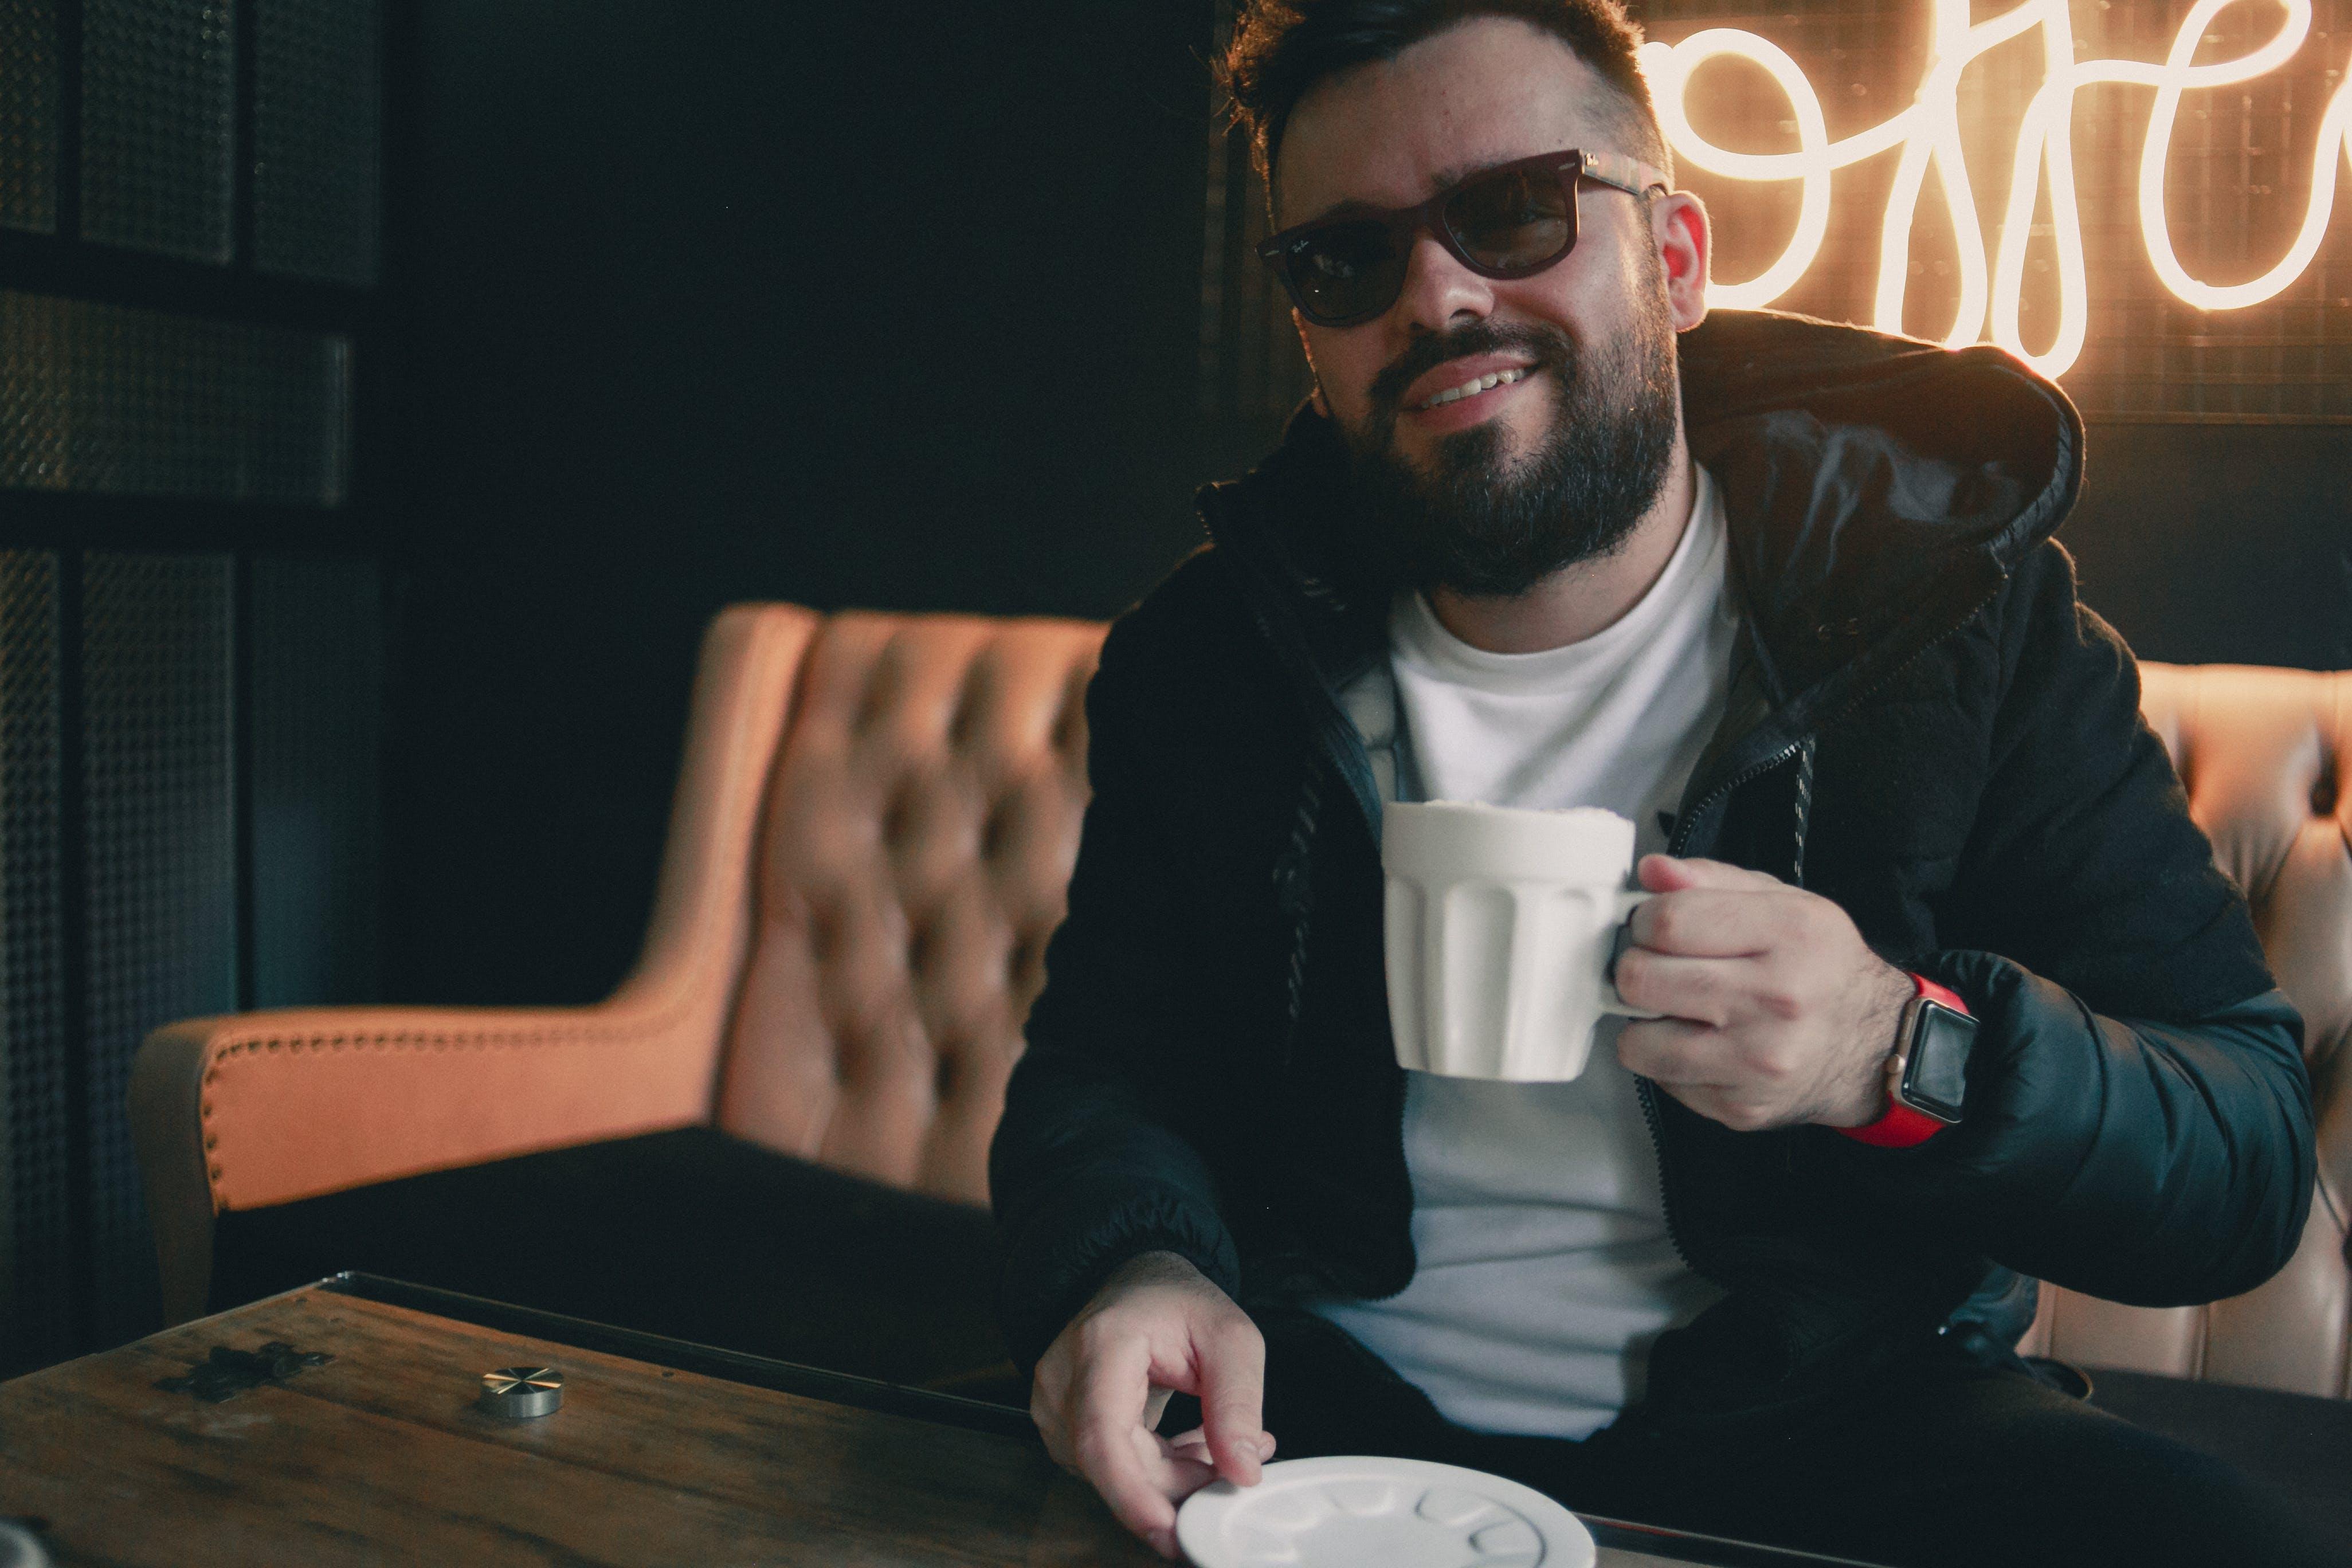 Smiling Man Sitting Near Table Holding Ceramic Mug Inside Room